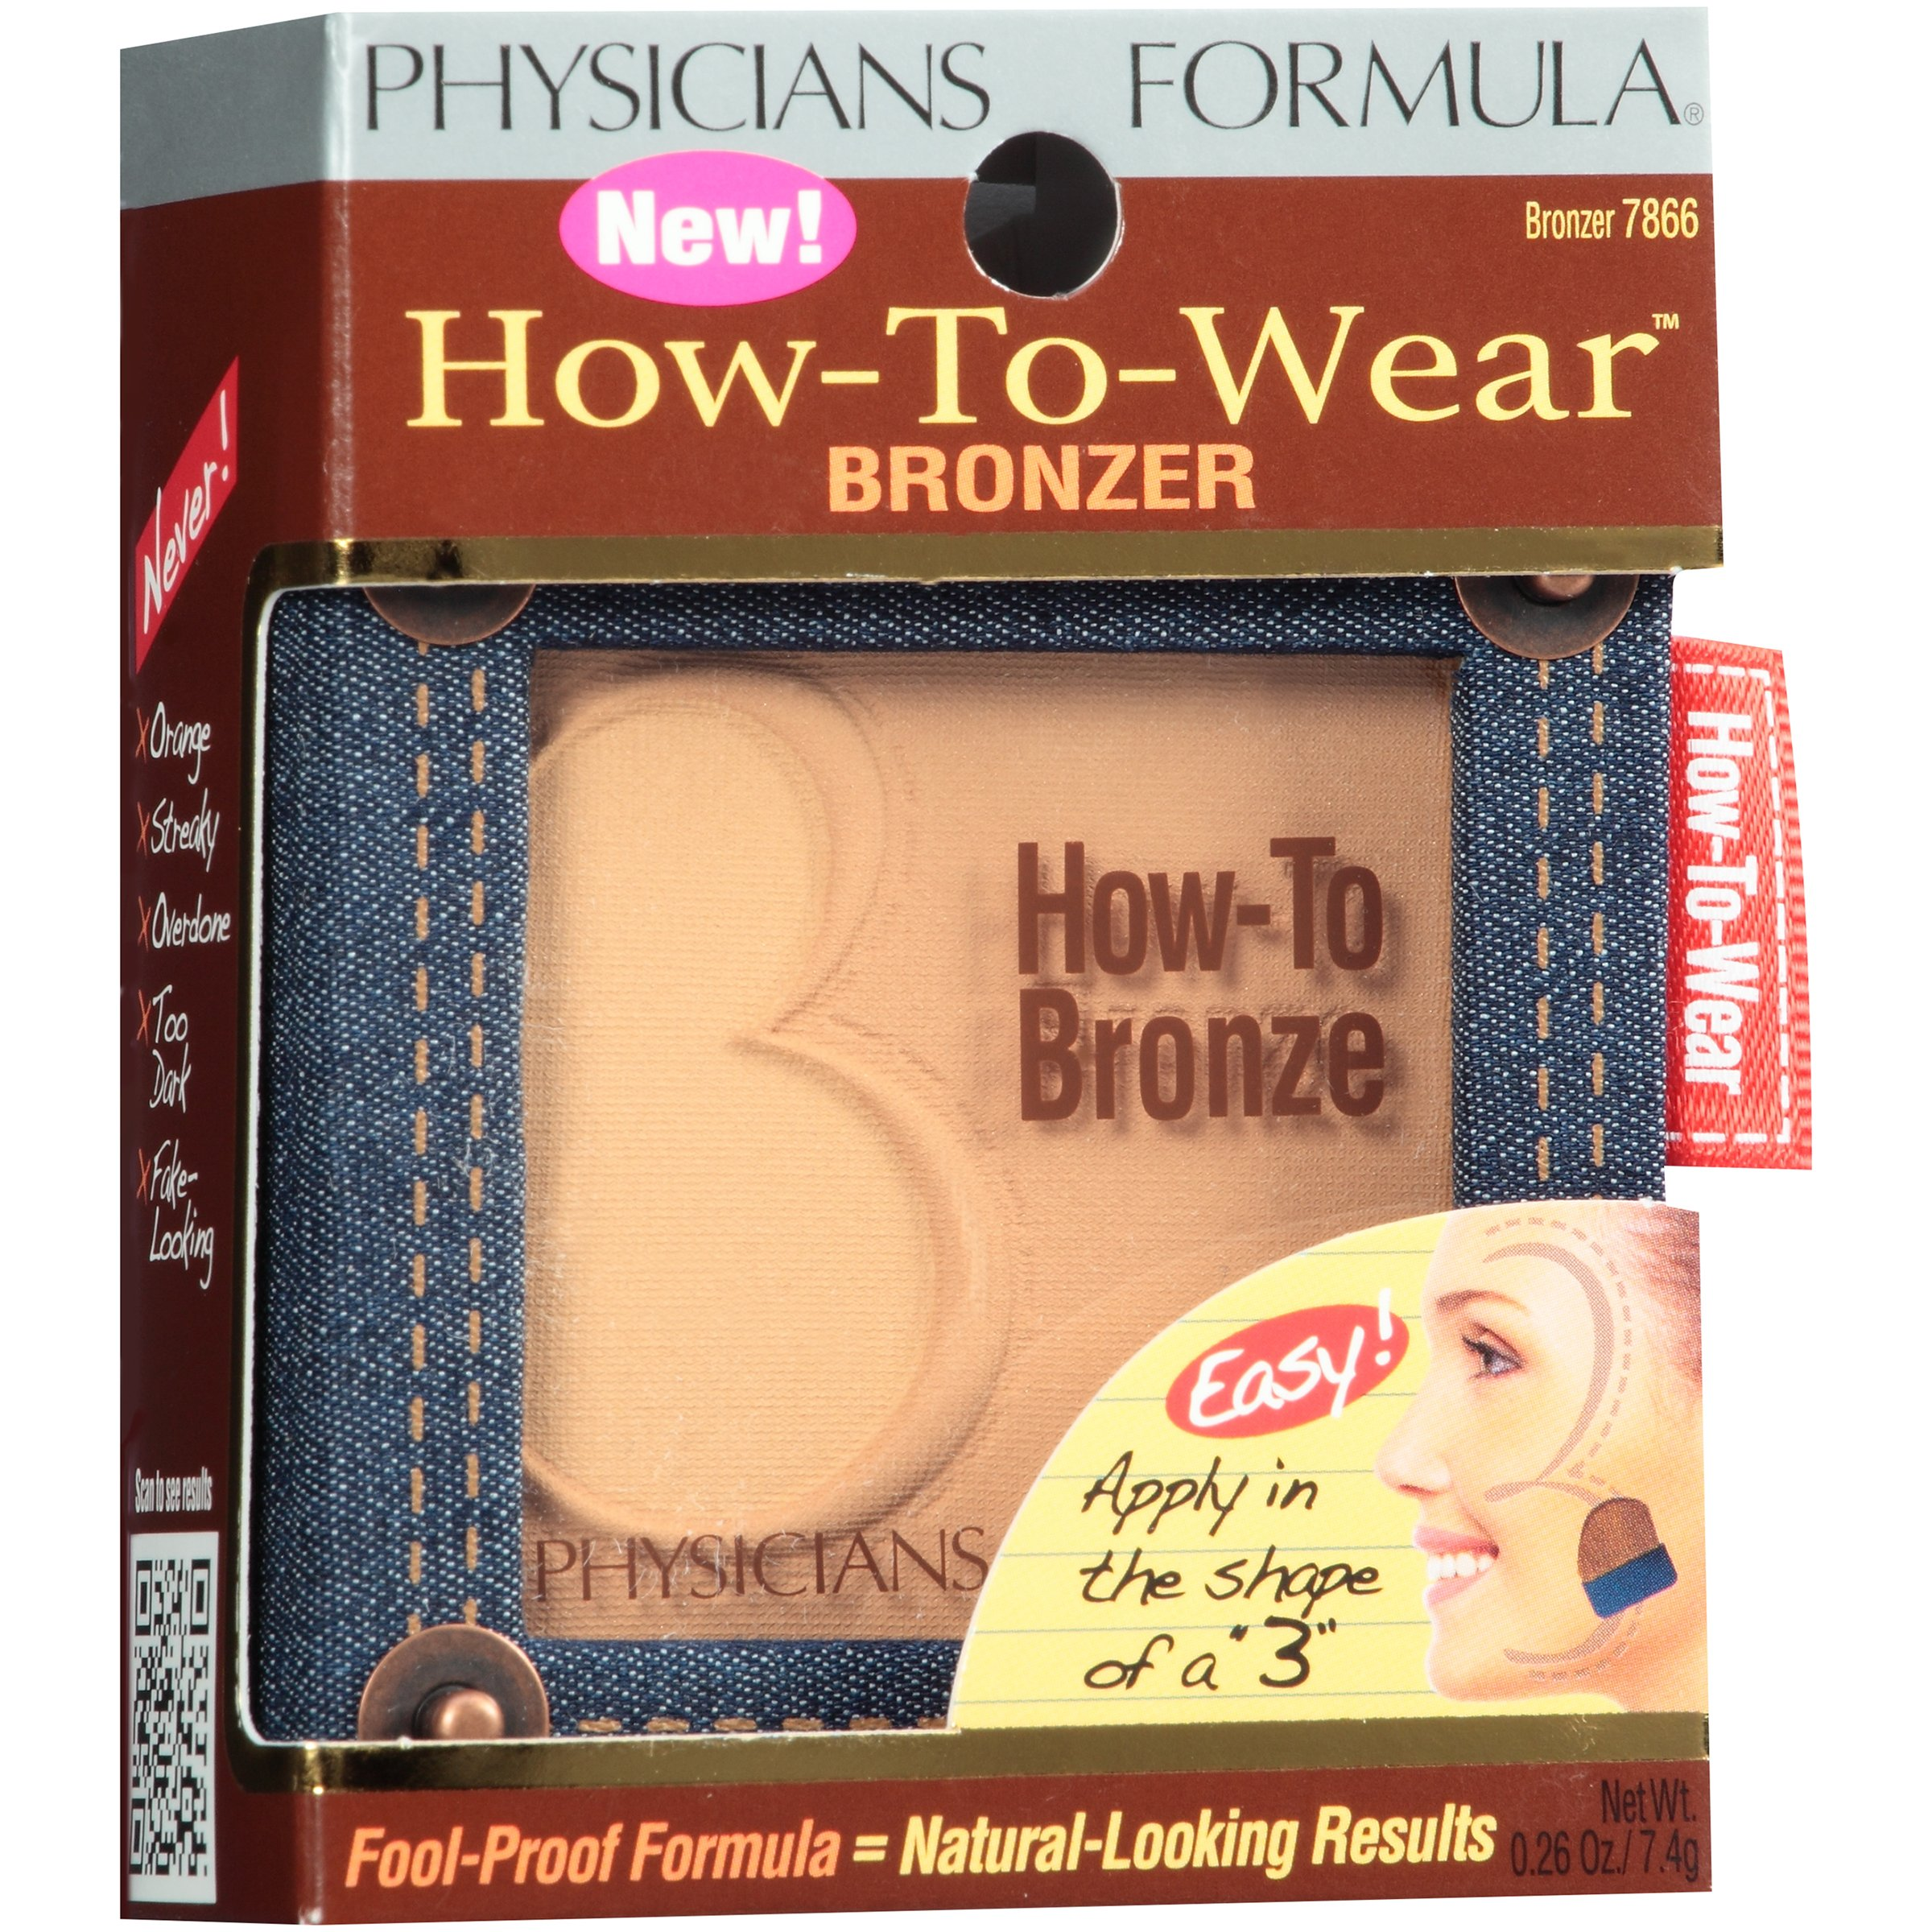 Physicians Formula How-To-Wear 2 Bronzer Bronzer 0.26 oz. Box